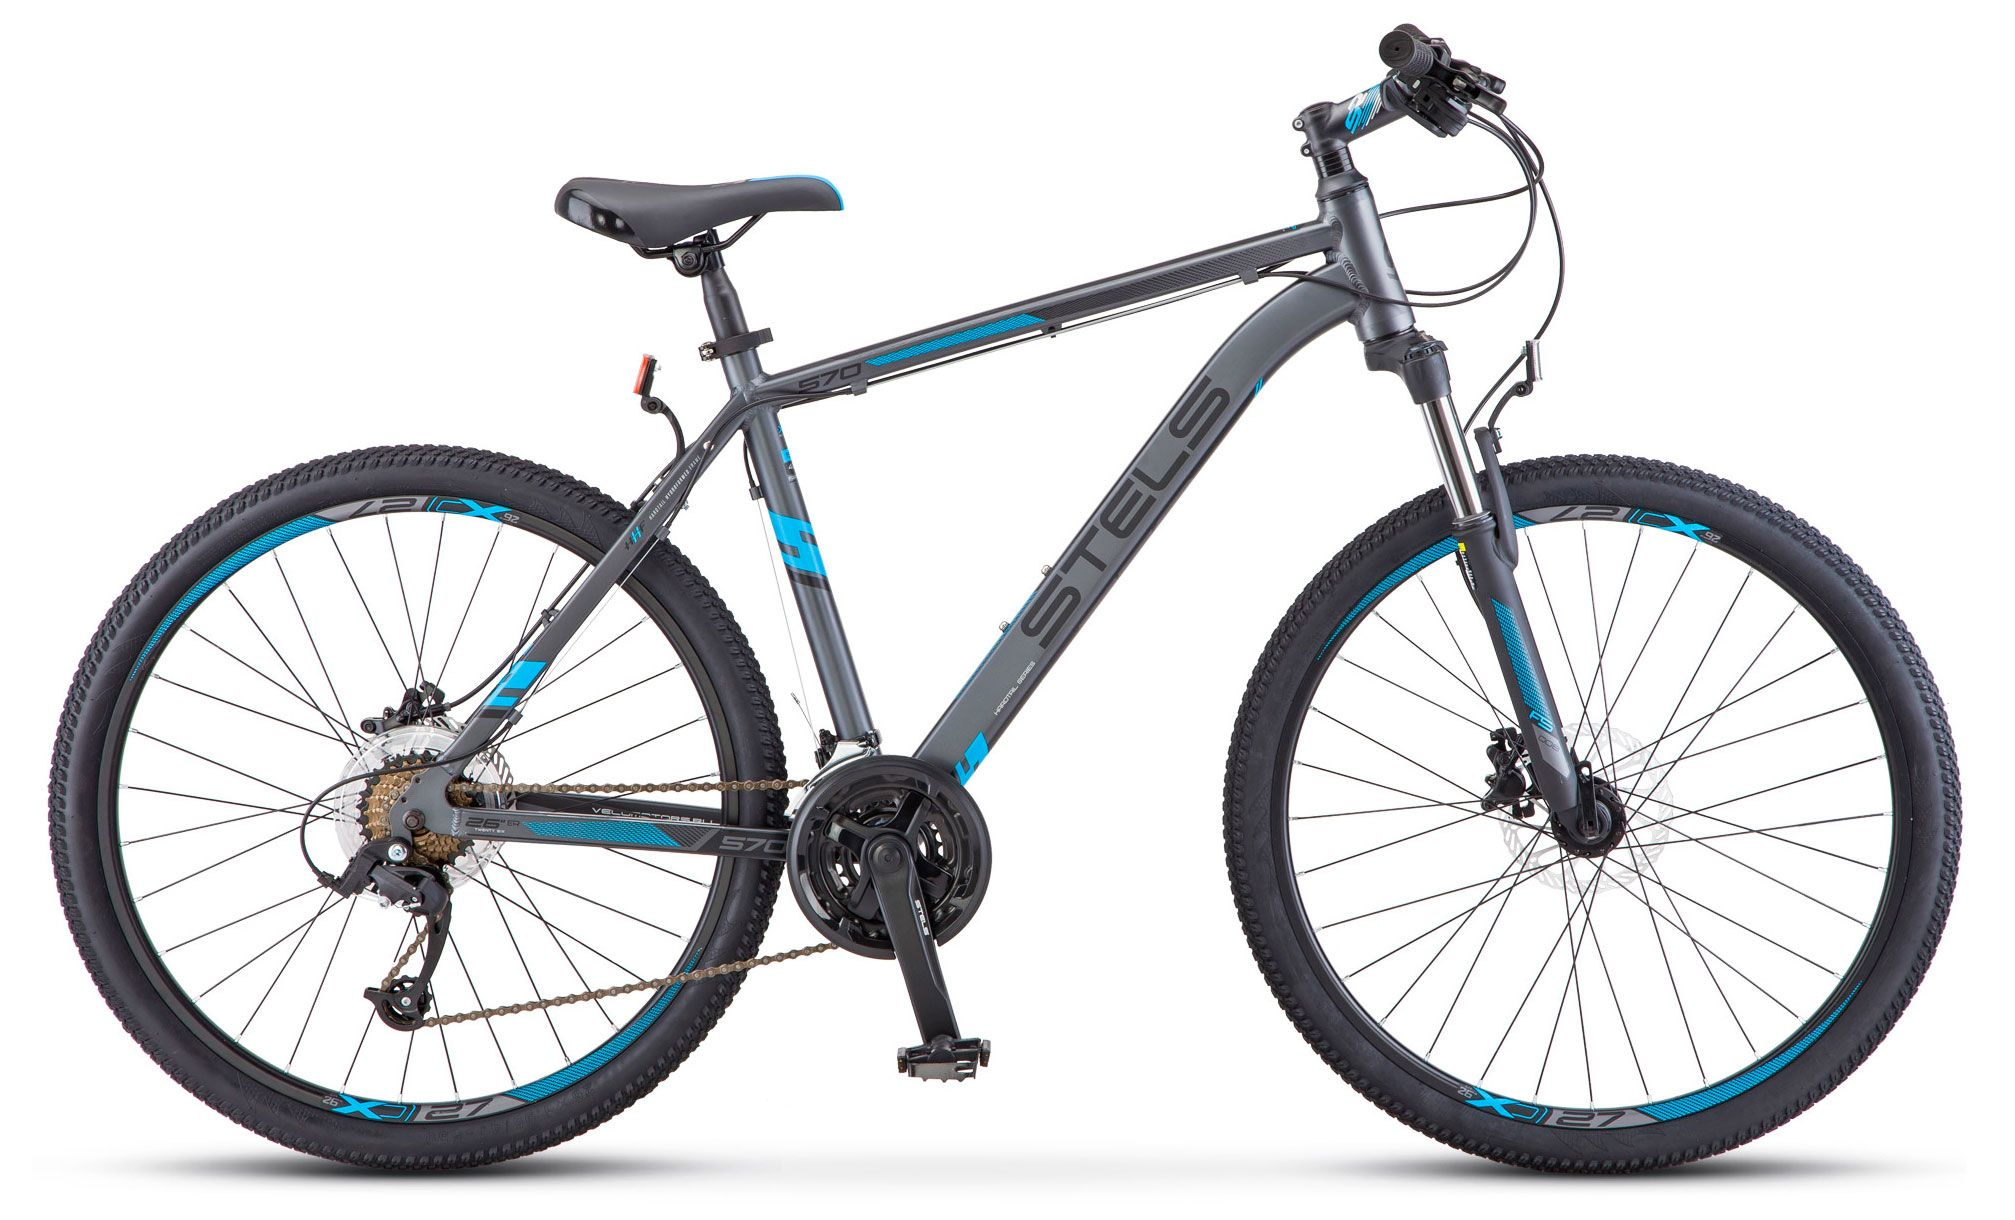 Велосипед Stels Navigator 570 D 26 (V010) 2018 велосипед stels navigator 750 d 26 2015